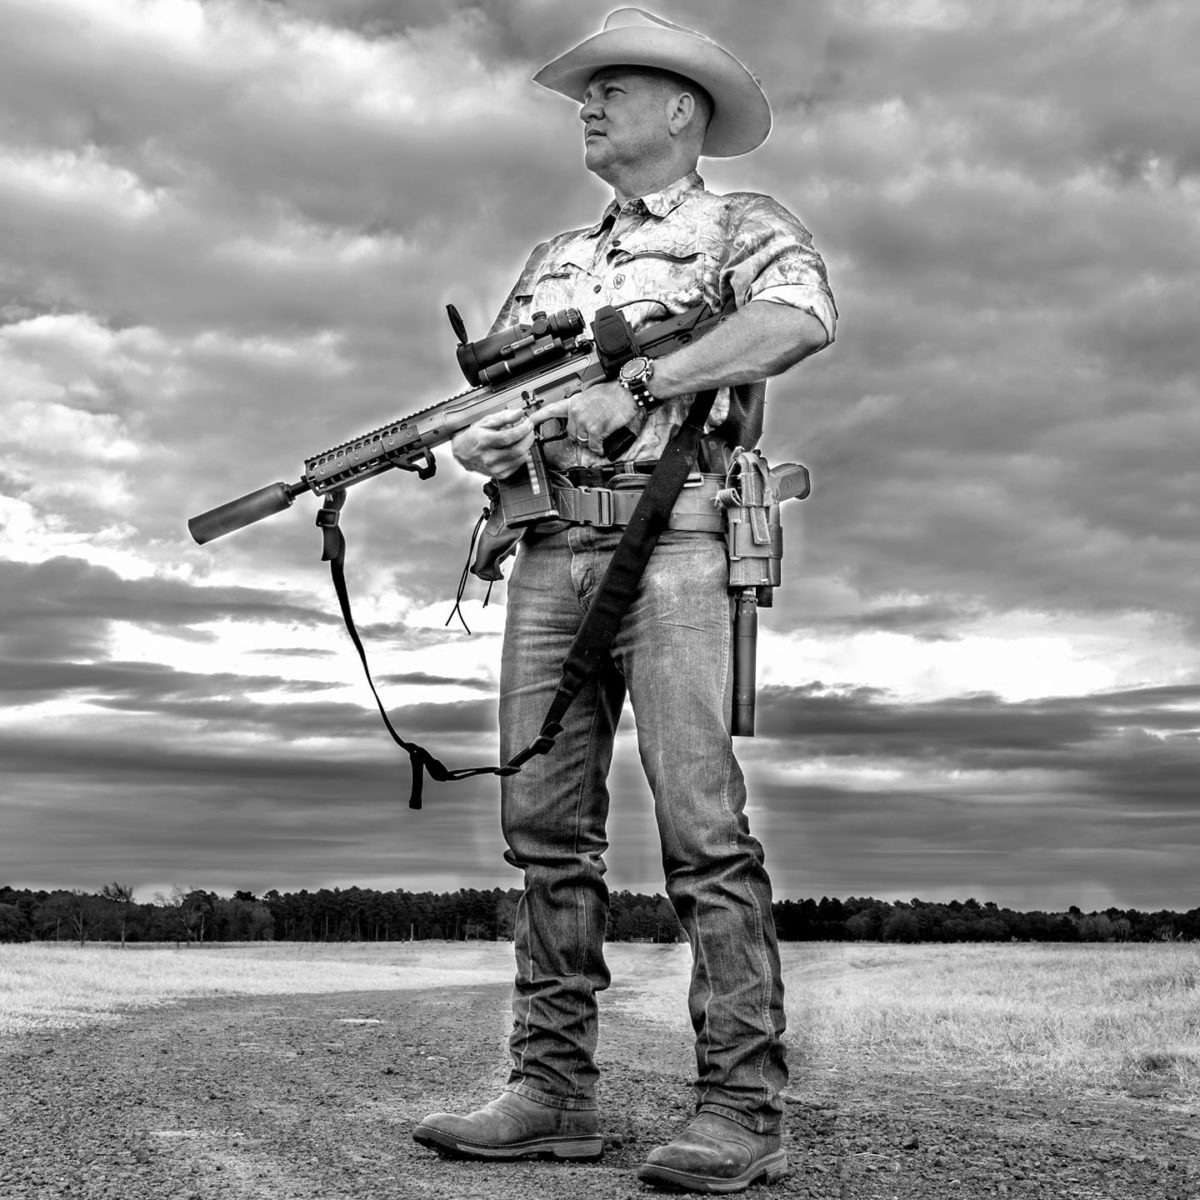 Todd Huey hog hunting